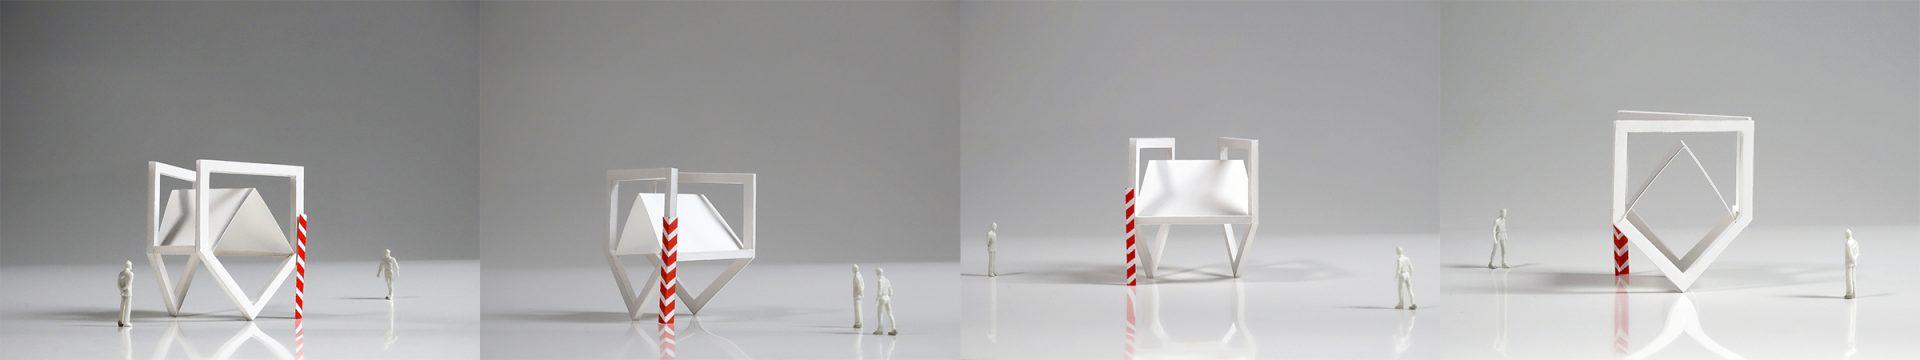 Thierry Ferreira , arte, art, escultura, Sculpture, arquitetura, architecture, arte contemporânea, contemporary art, projecto, projet, project